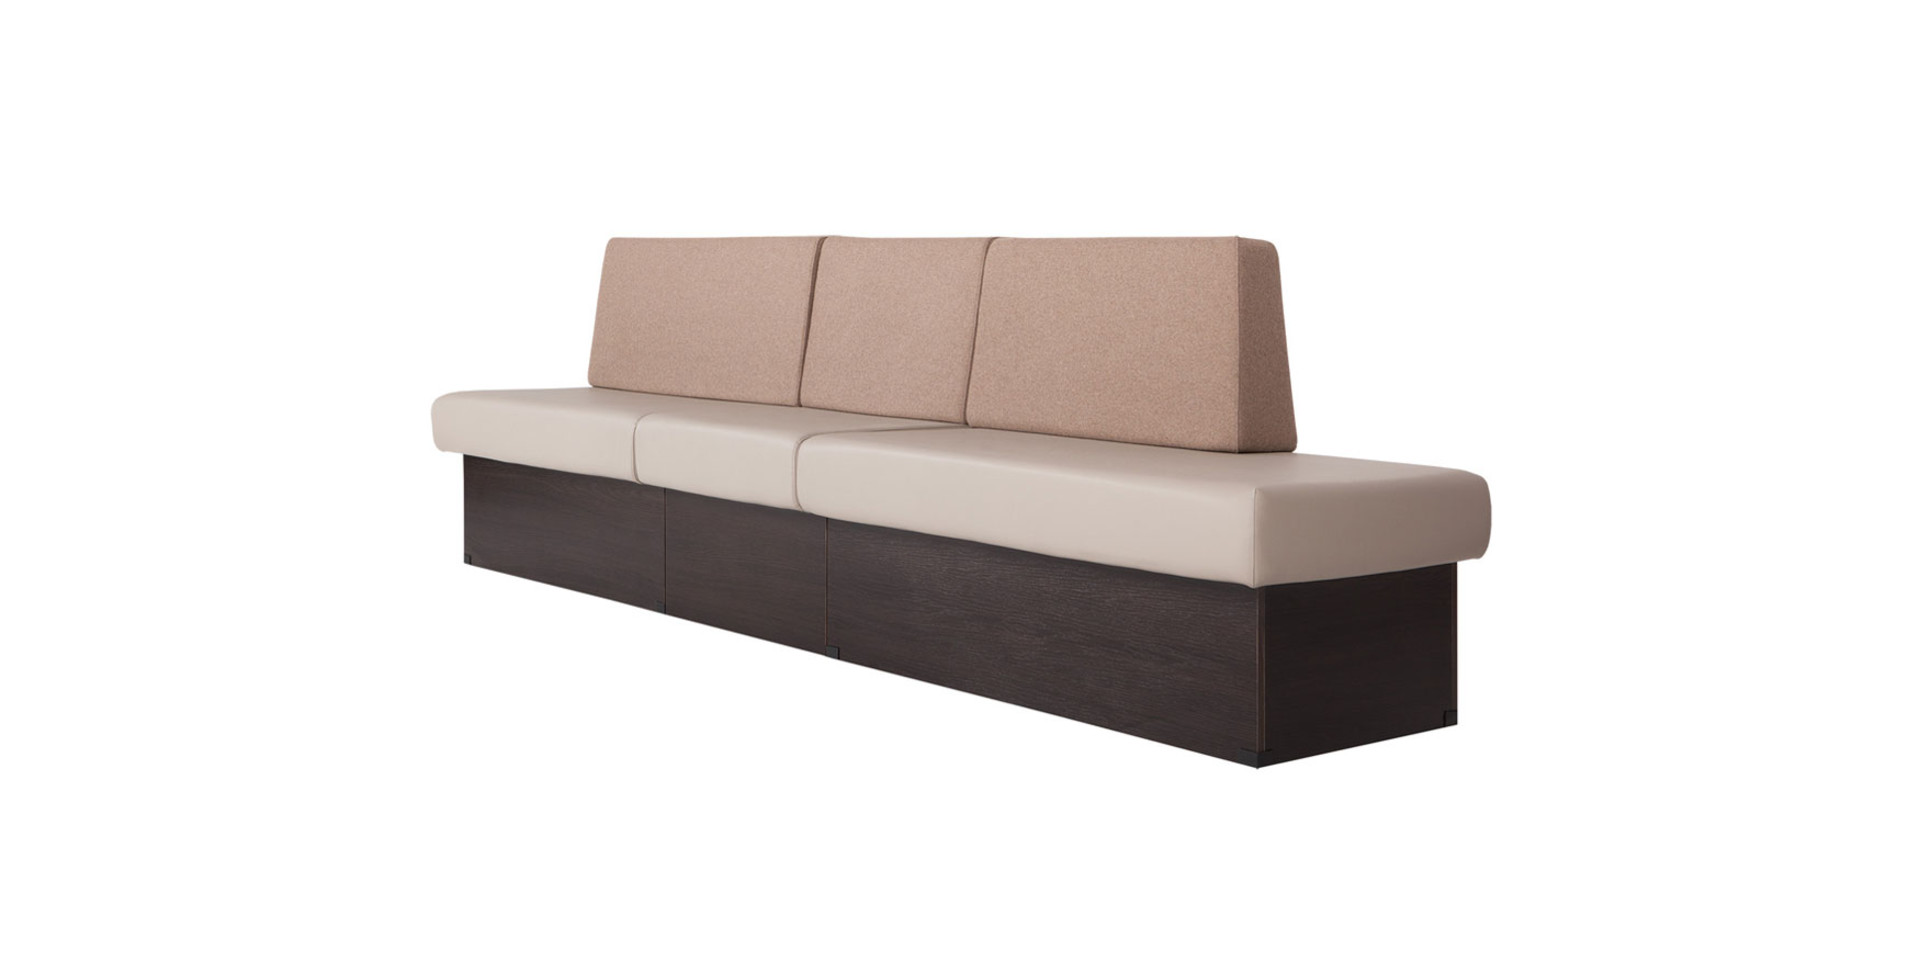 sits-hedda-angle-elements_panno1026_light_brown_sixty13_sahara_2